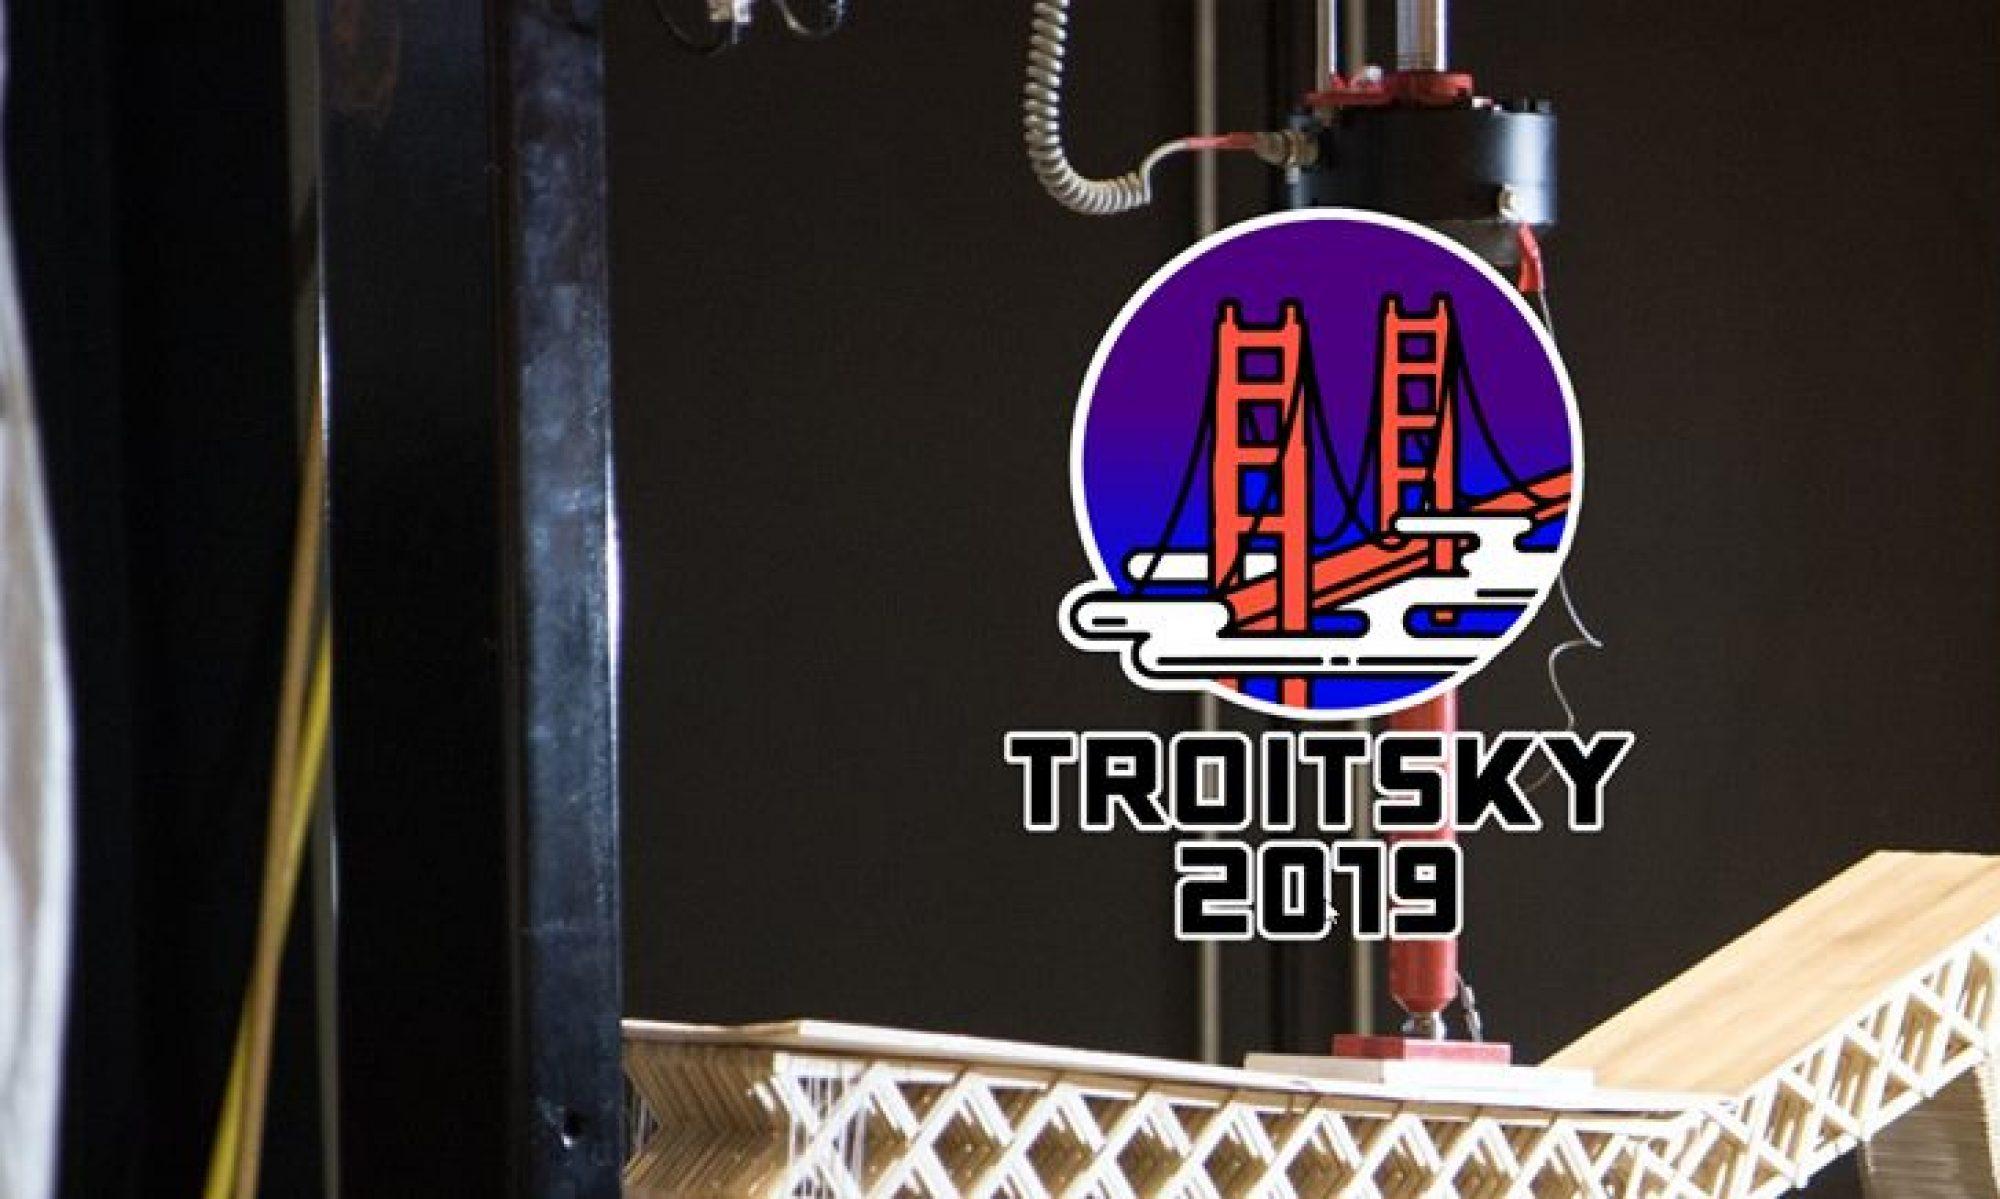 U of T Troitsky Bridge Building Club